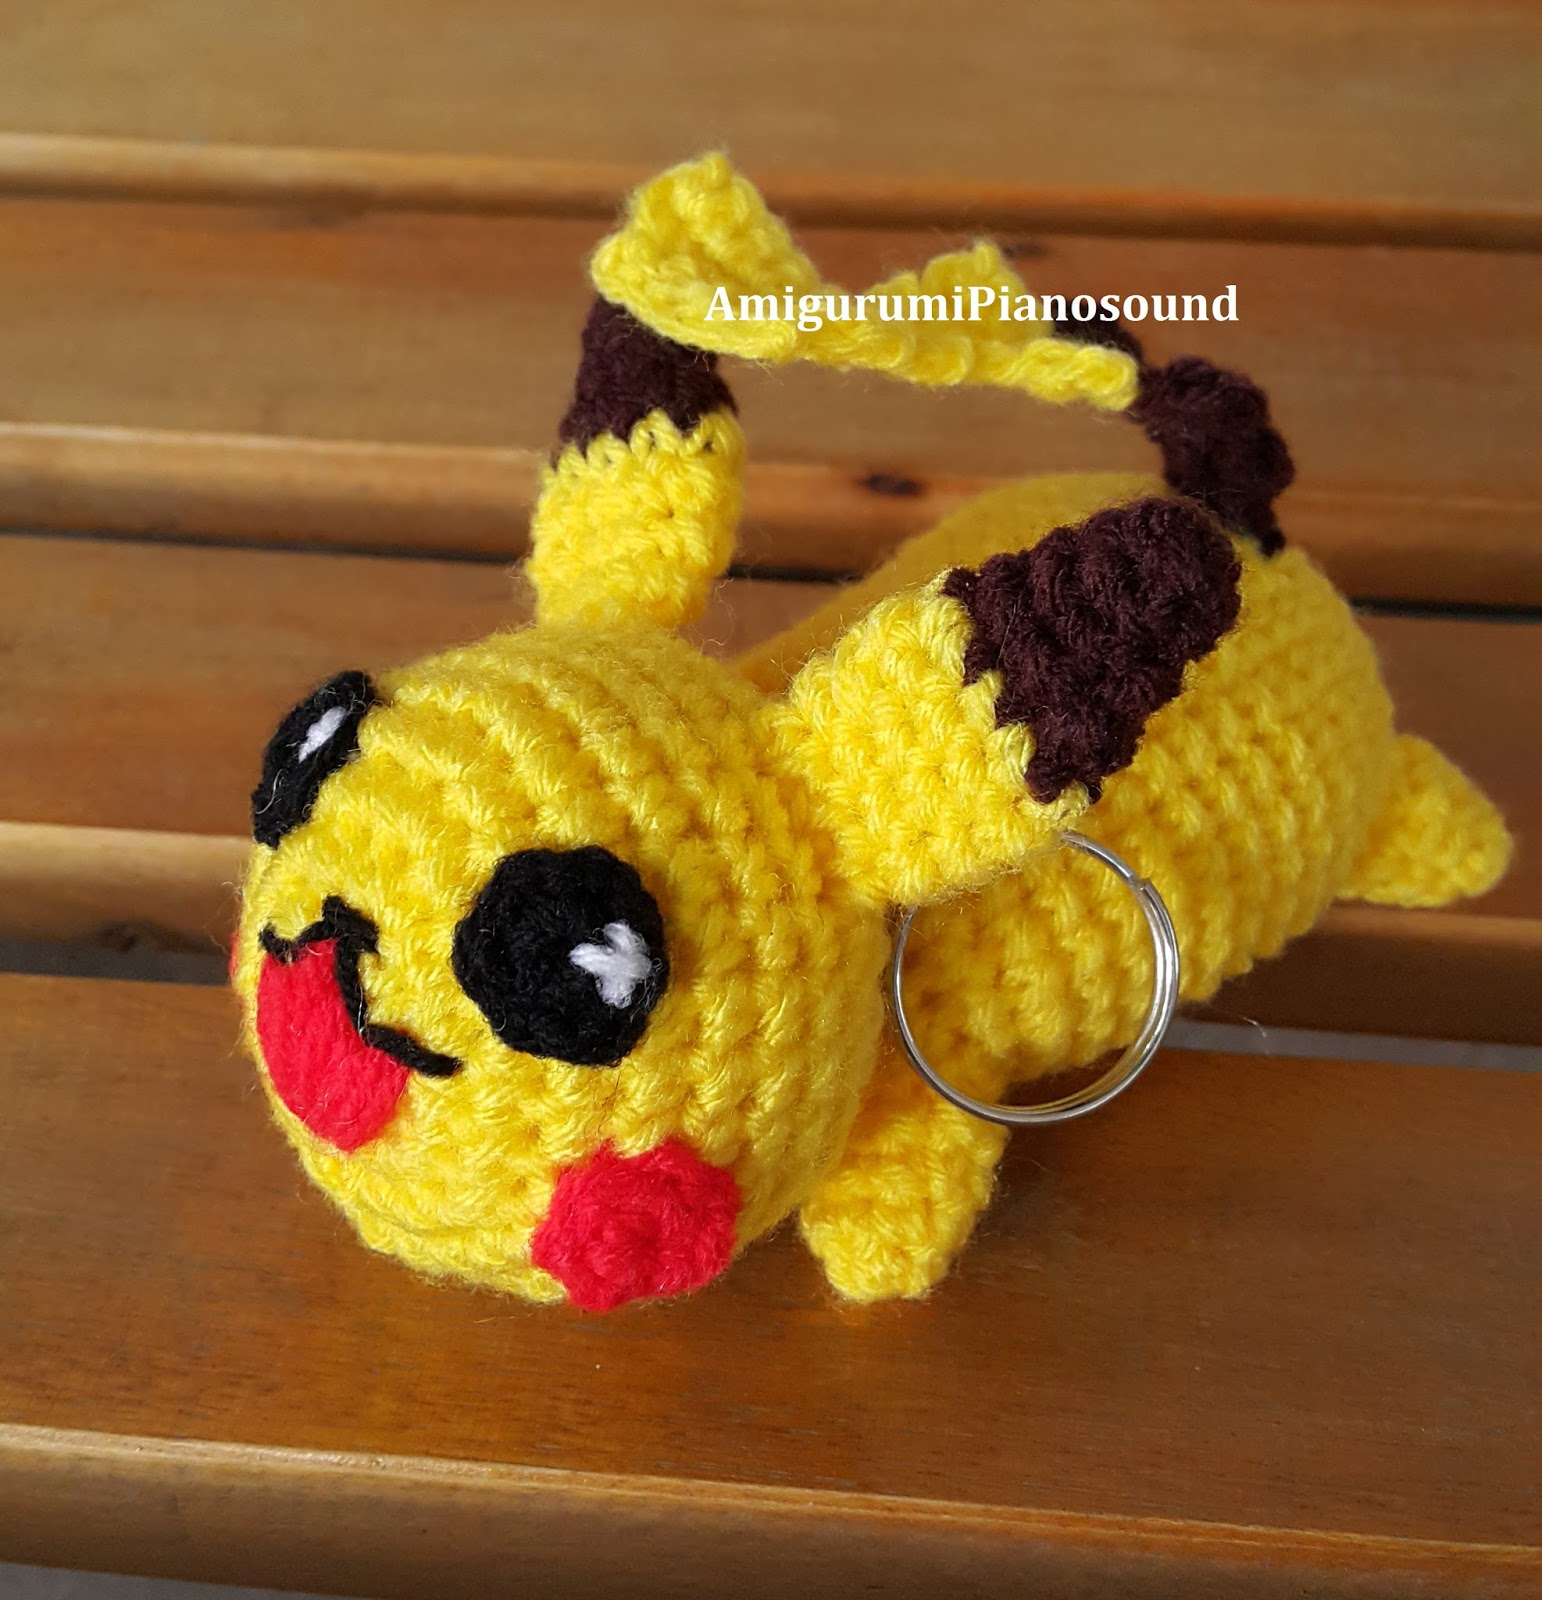 Amigurumipianosound Crochet Blog Pikachu Keychain Pattern